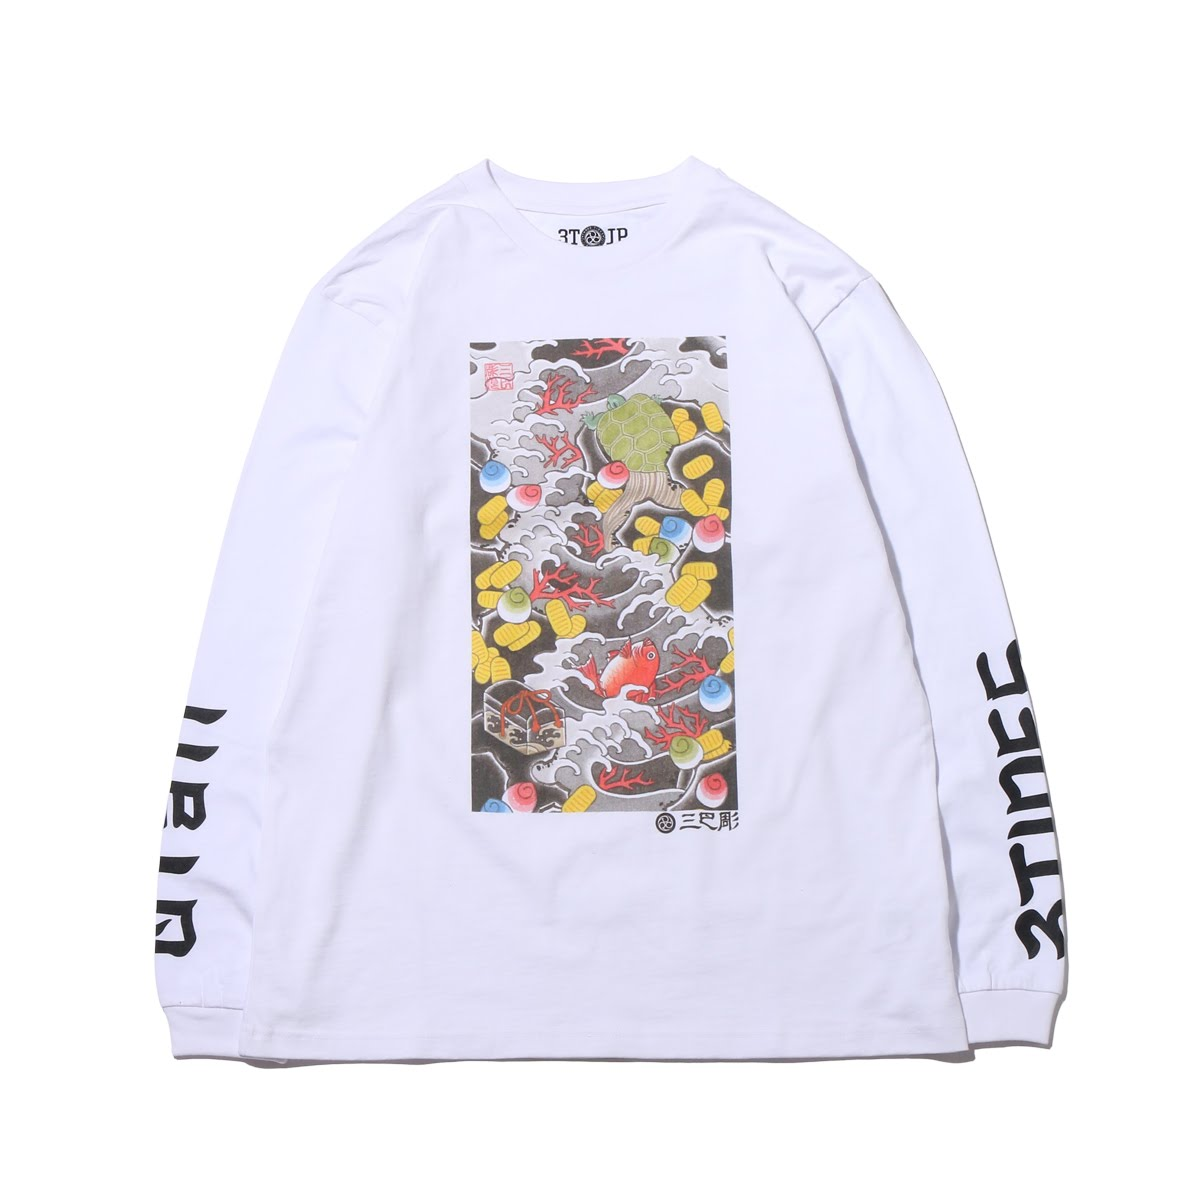 "UBIQ ""IREZUMI"" LS T-SHIRT(Takarazukushi) Designed by NAMI(イレズミ ロングスリーブ Tシャツ(タカラズクシ) デザインド バイ ナミ)(WHITE)18SS-I"